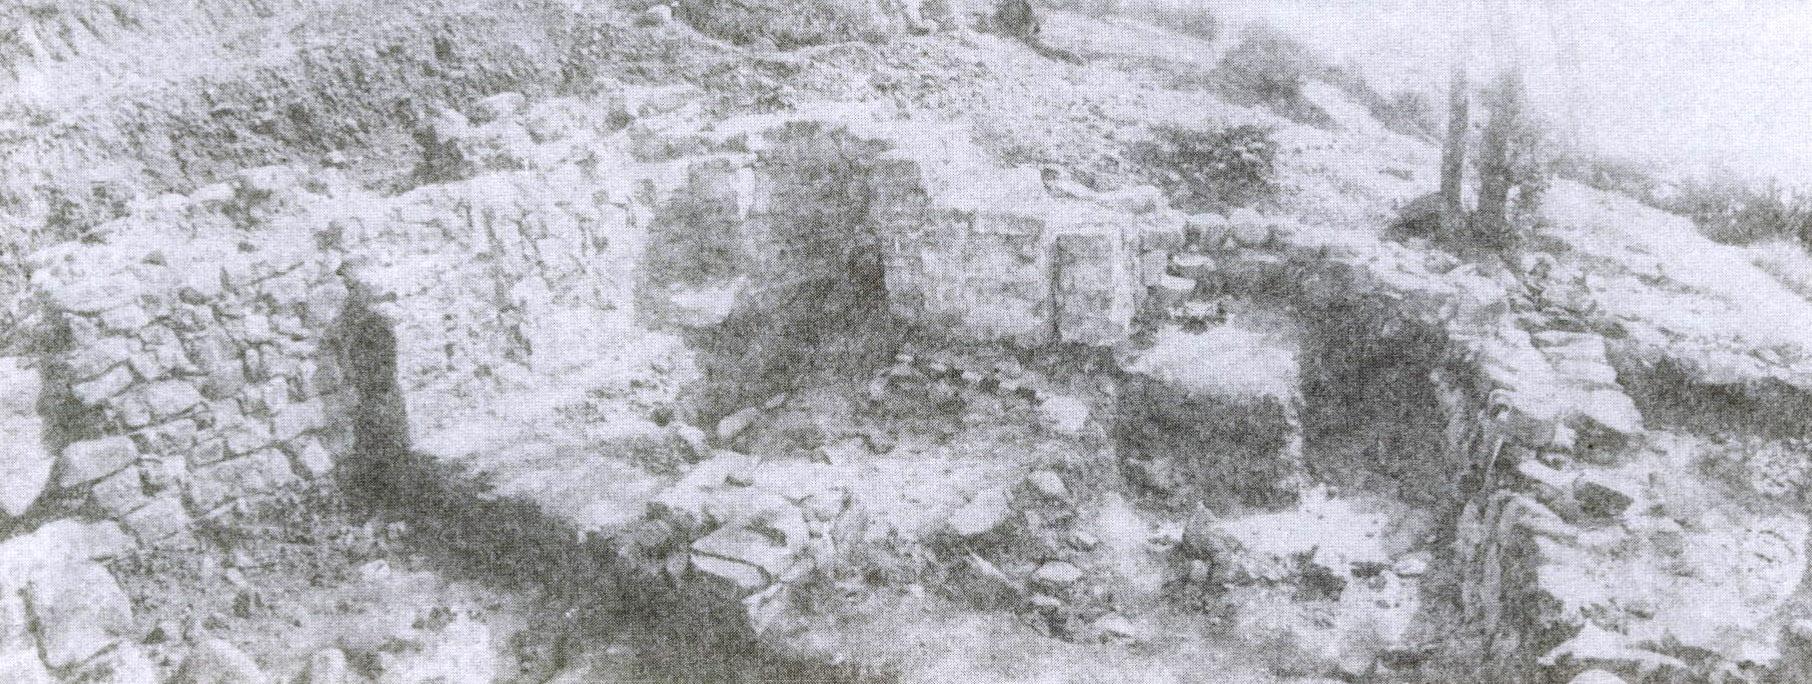 Рис. 5. Вид на апсиды изнутри храма.